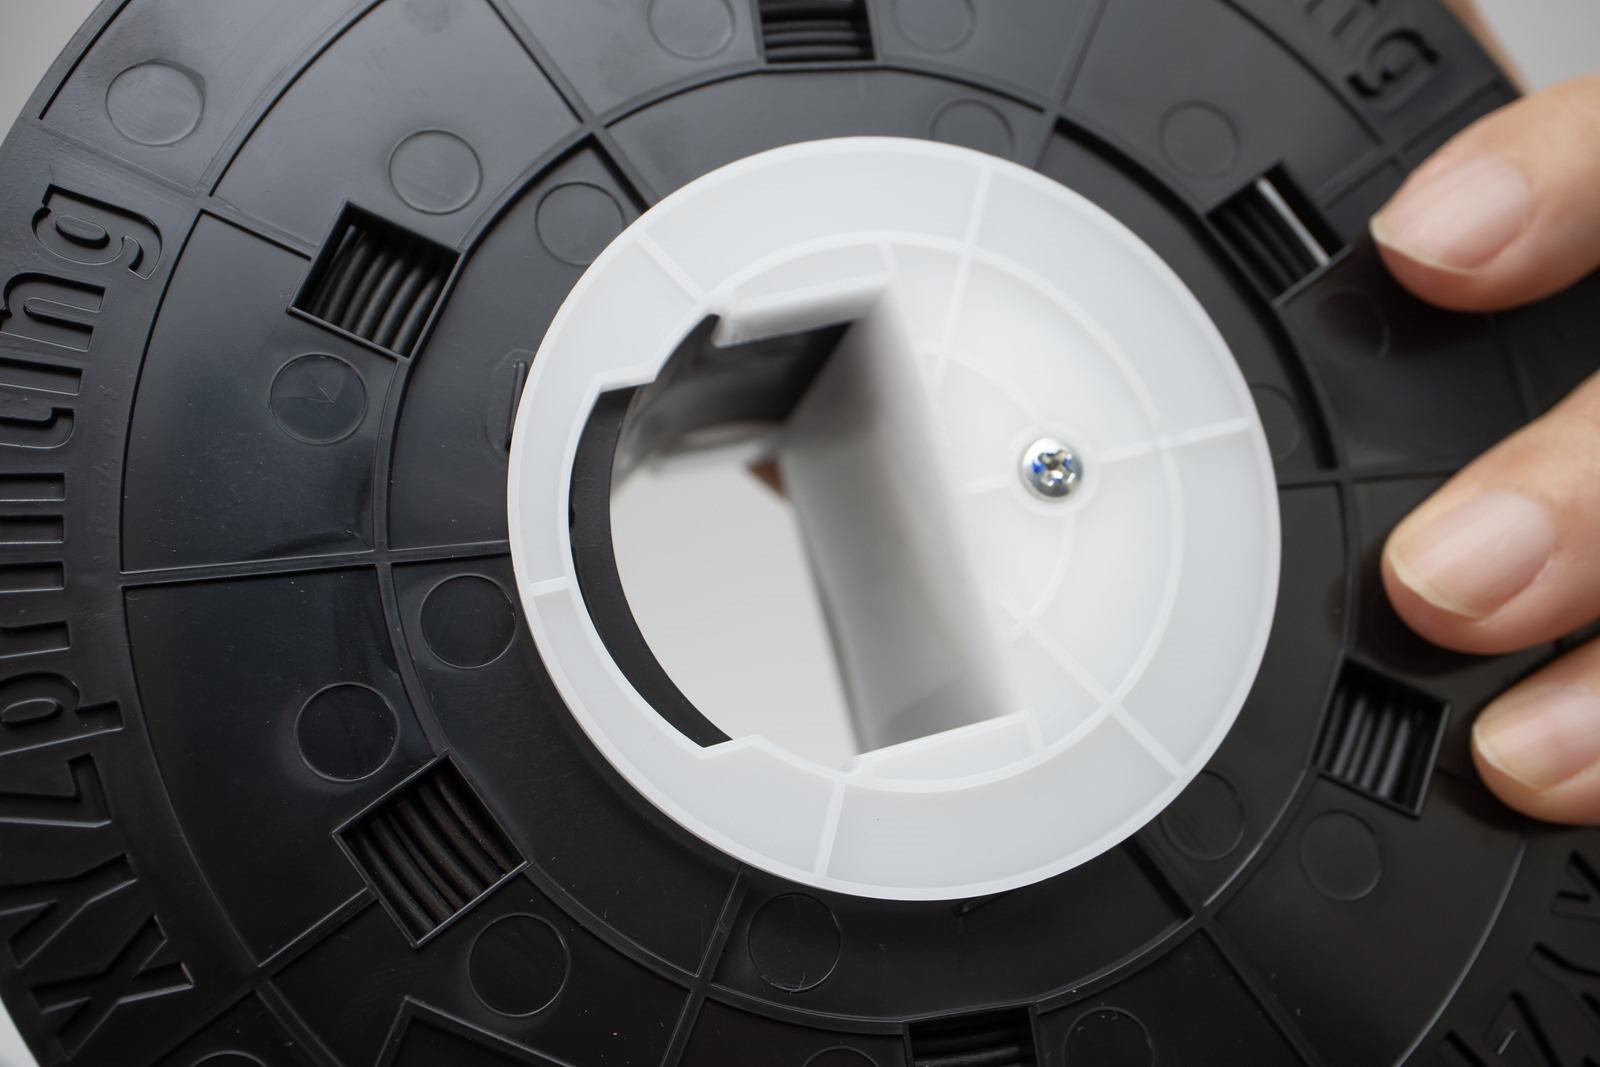 多功能3D列印機-da Vinci Jr. Pro X+3D列印機若使用原廠線材有NFC晶片在其線材軸,可讓機器透過讀取晶片偵測線材剩餘量以及自動調整最適合的參數設定